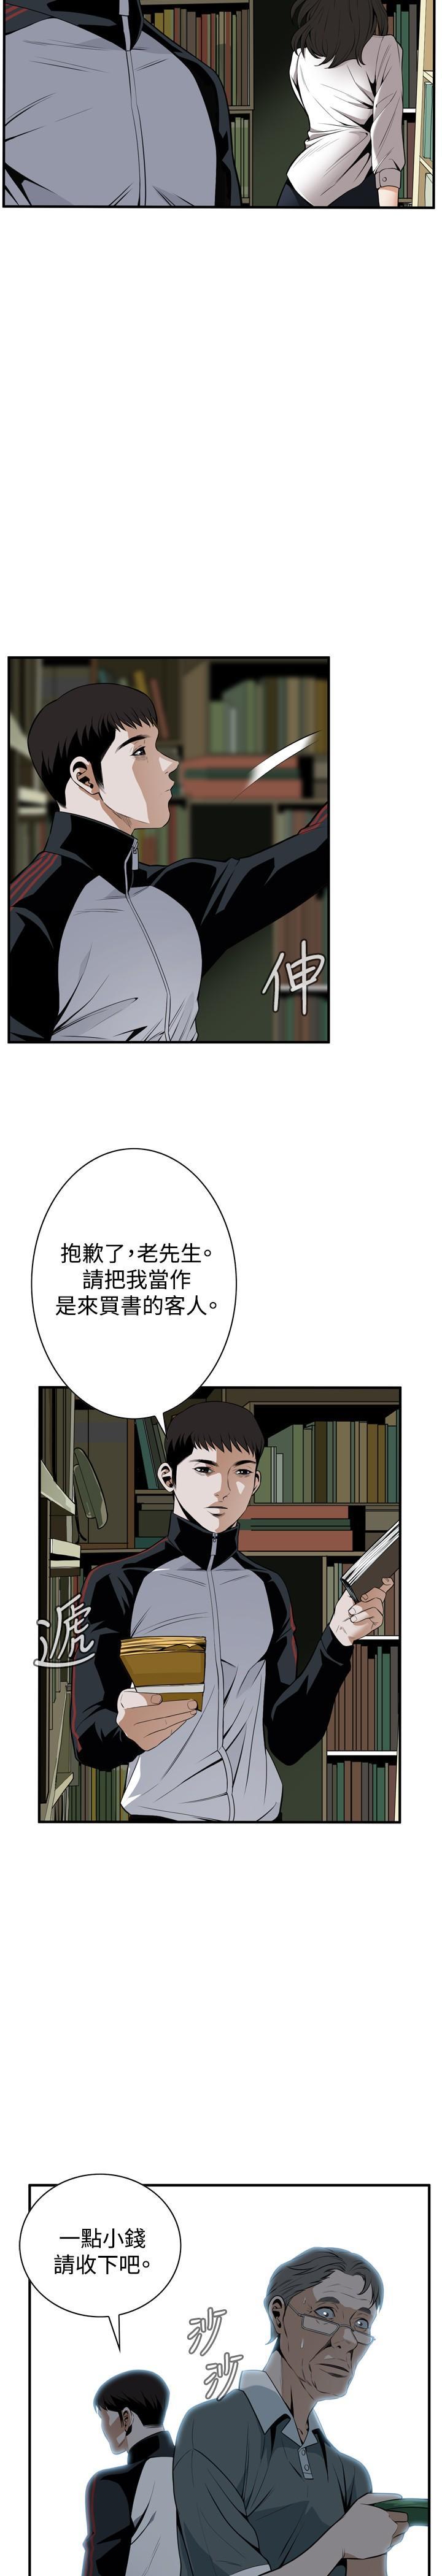 Take a Peek 偷窥 Ch.39~51 [Chinese]中文 90